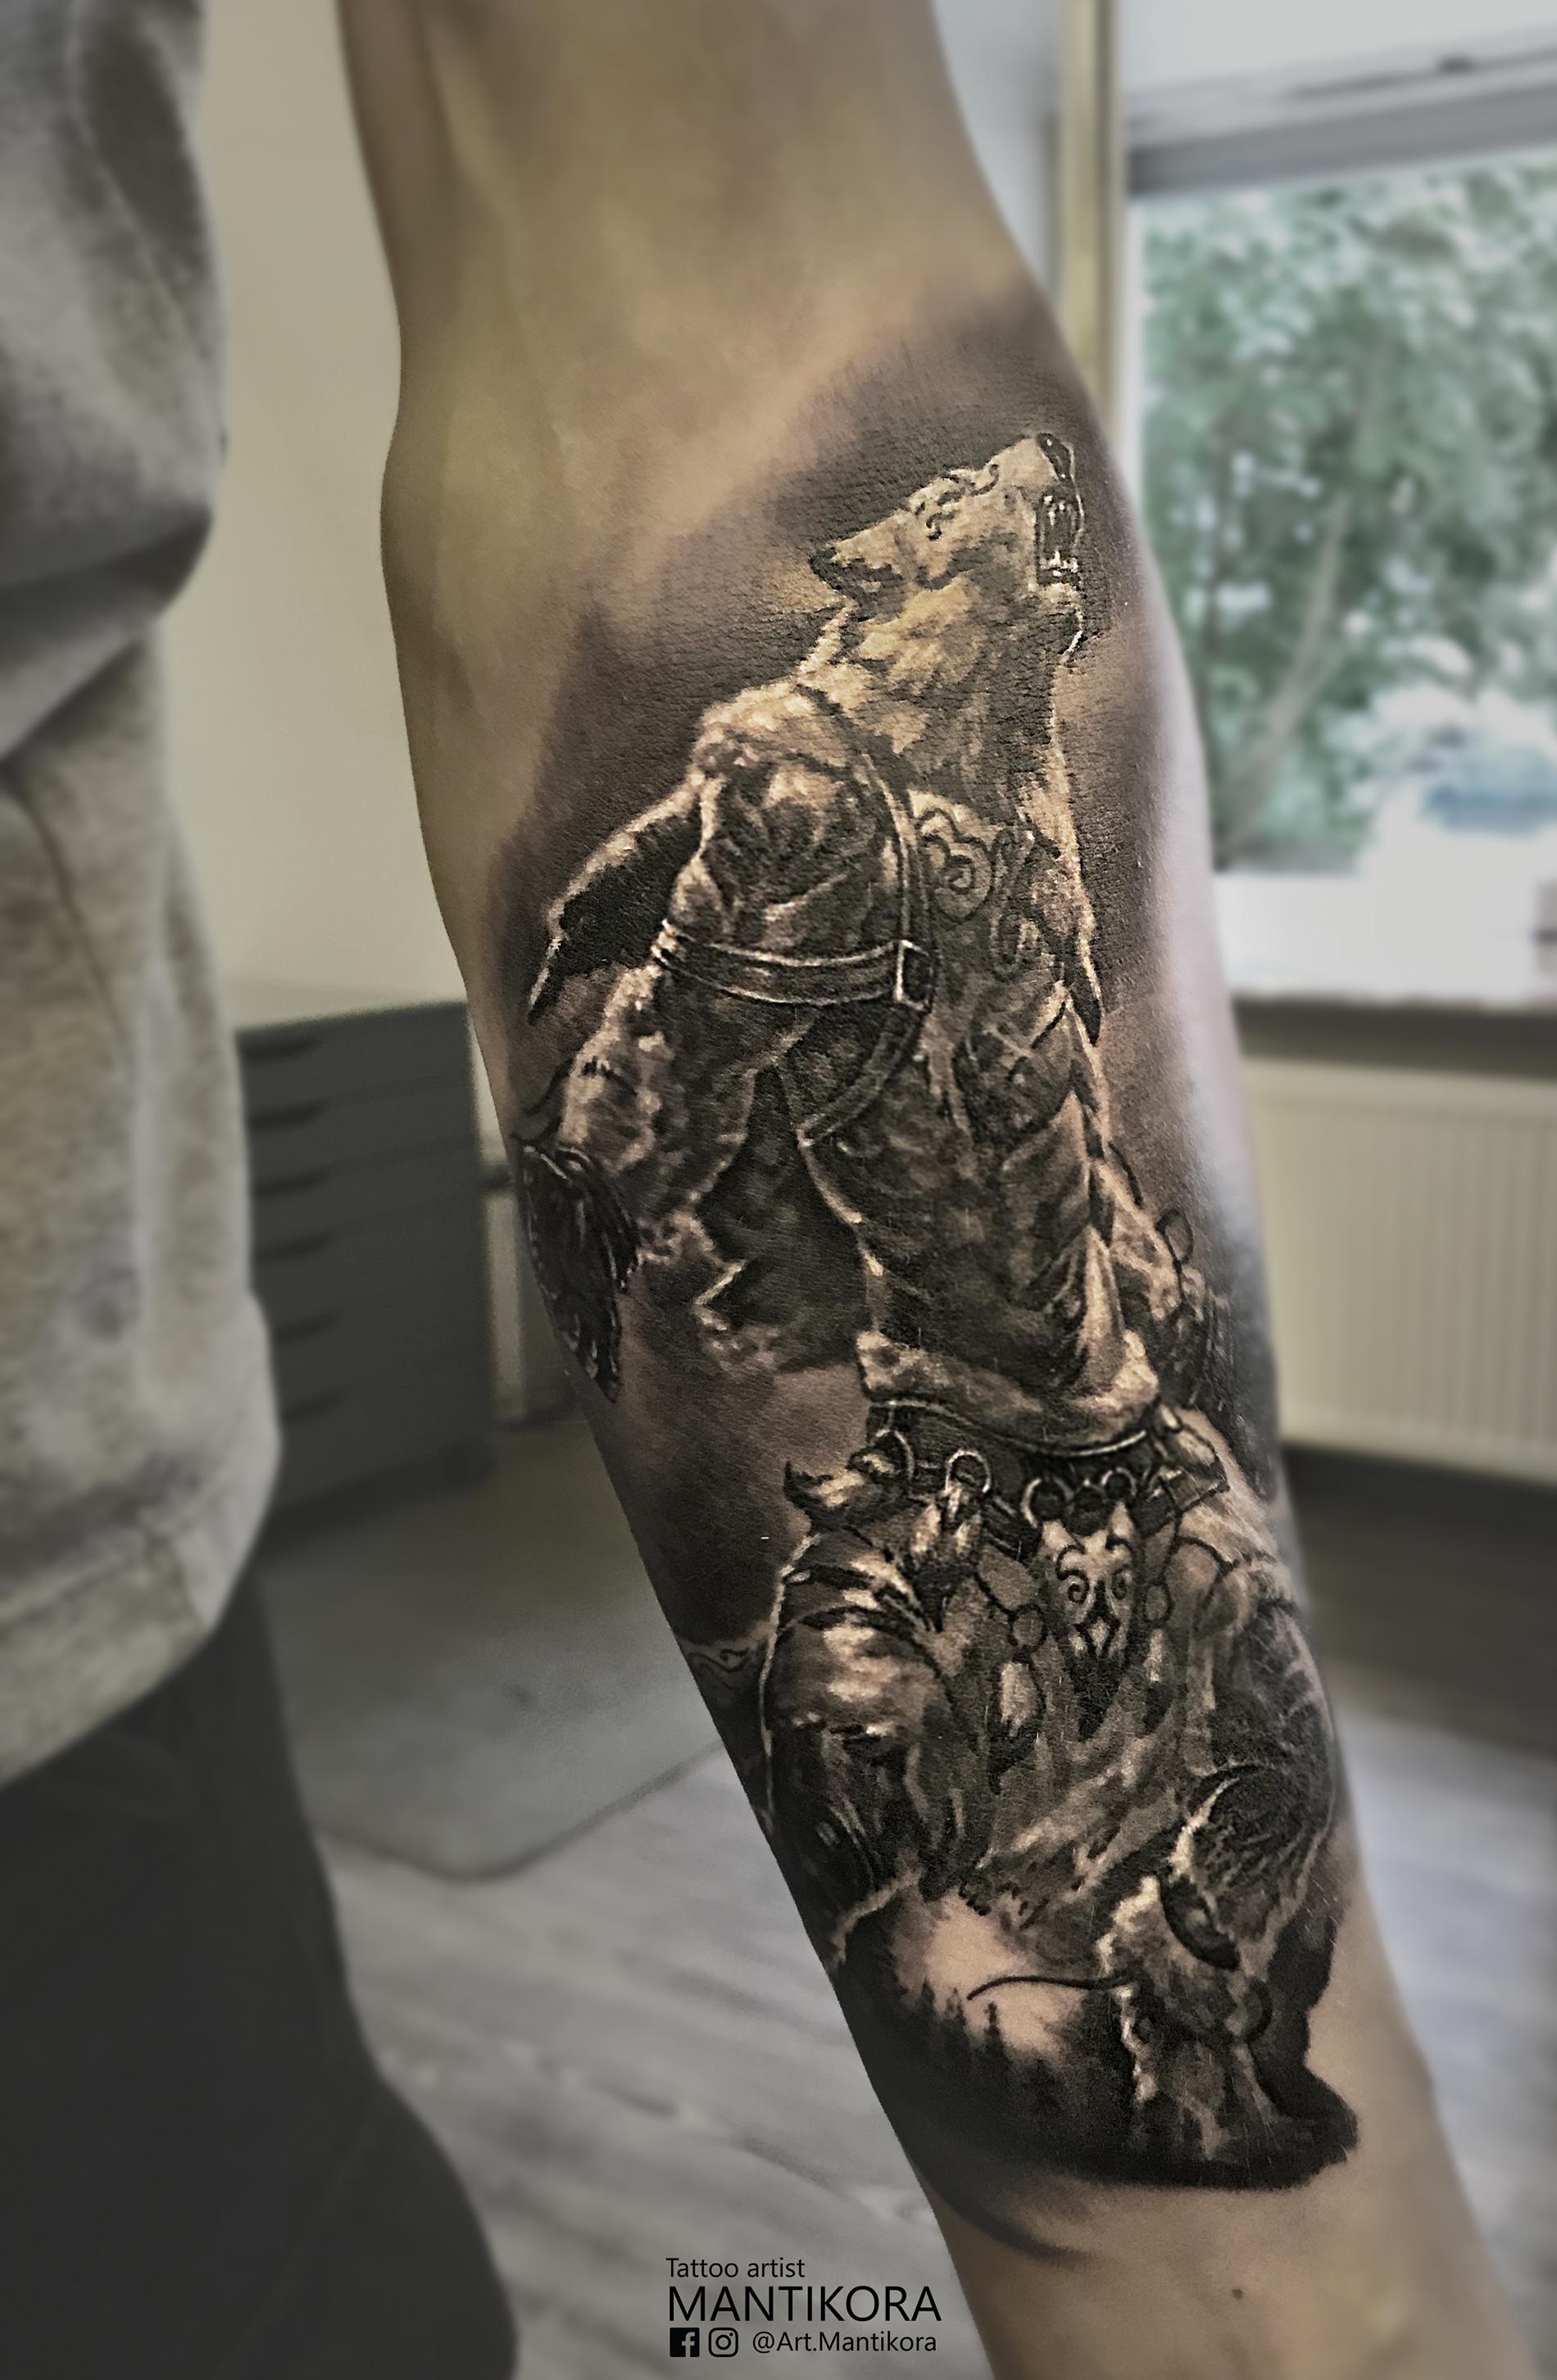 Werewolf Tattoo I Did A Few Days Ago Werewolf Tattoo Leg Sleeve Tattoo Body Art Tattoos